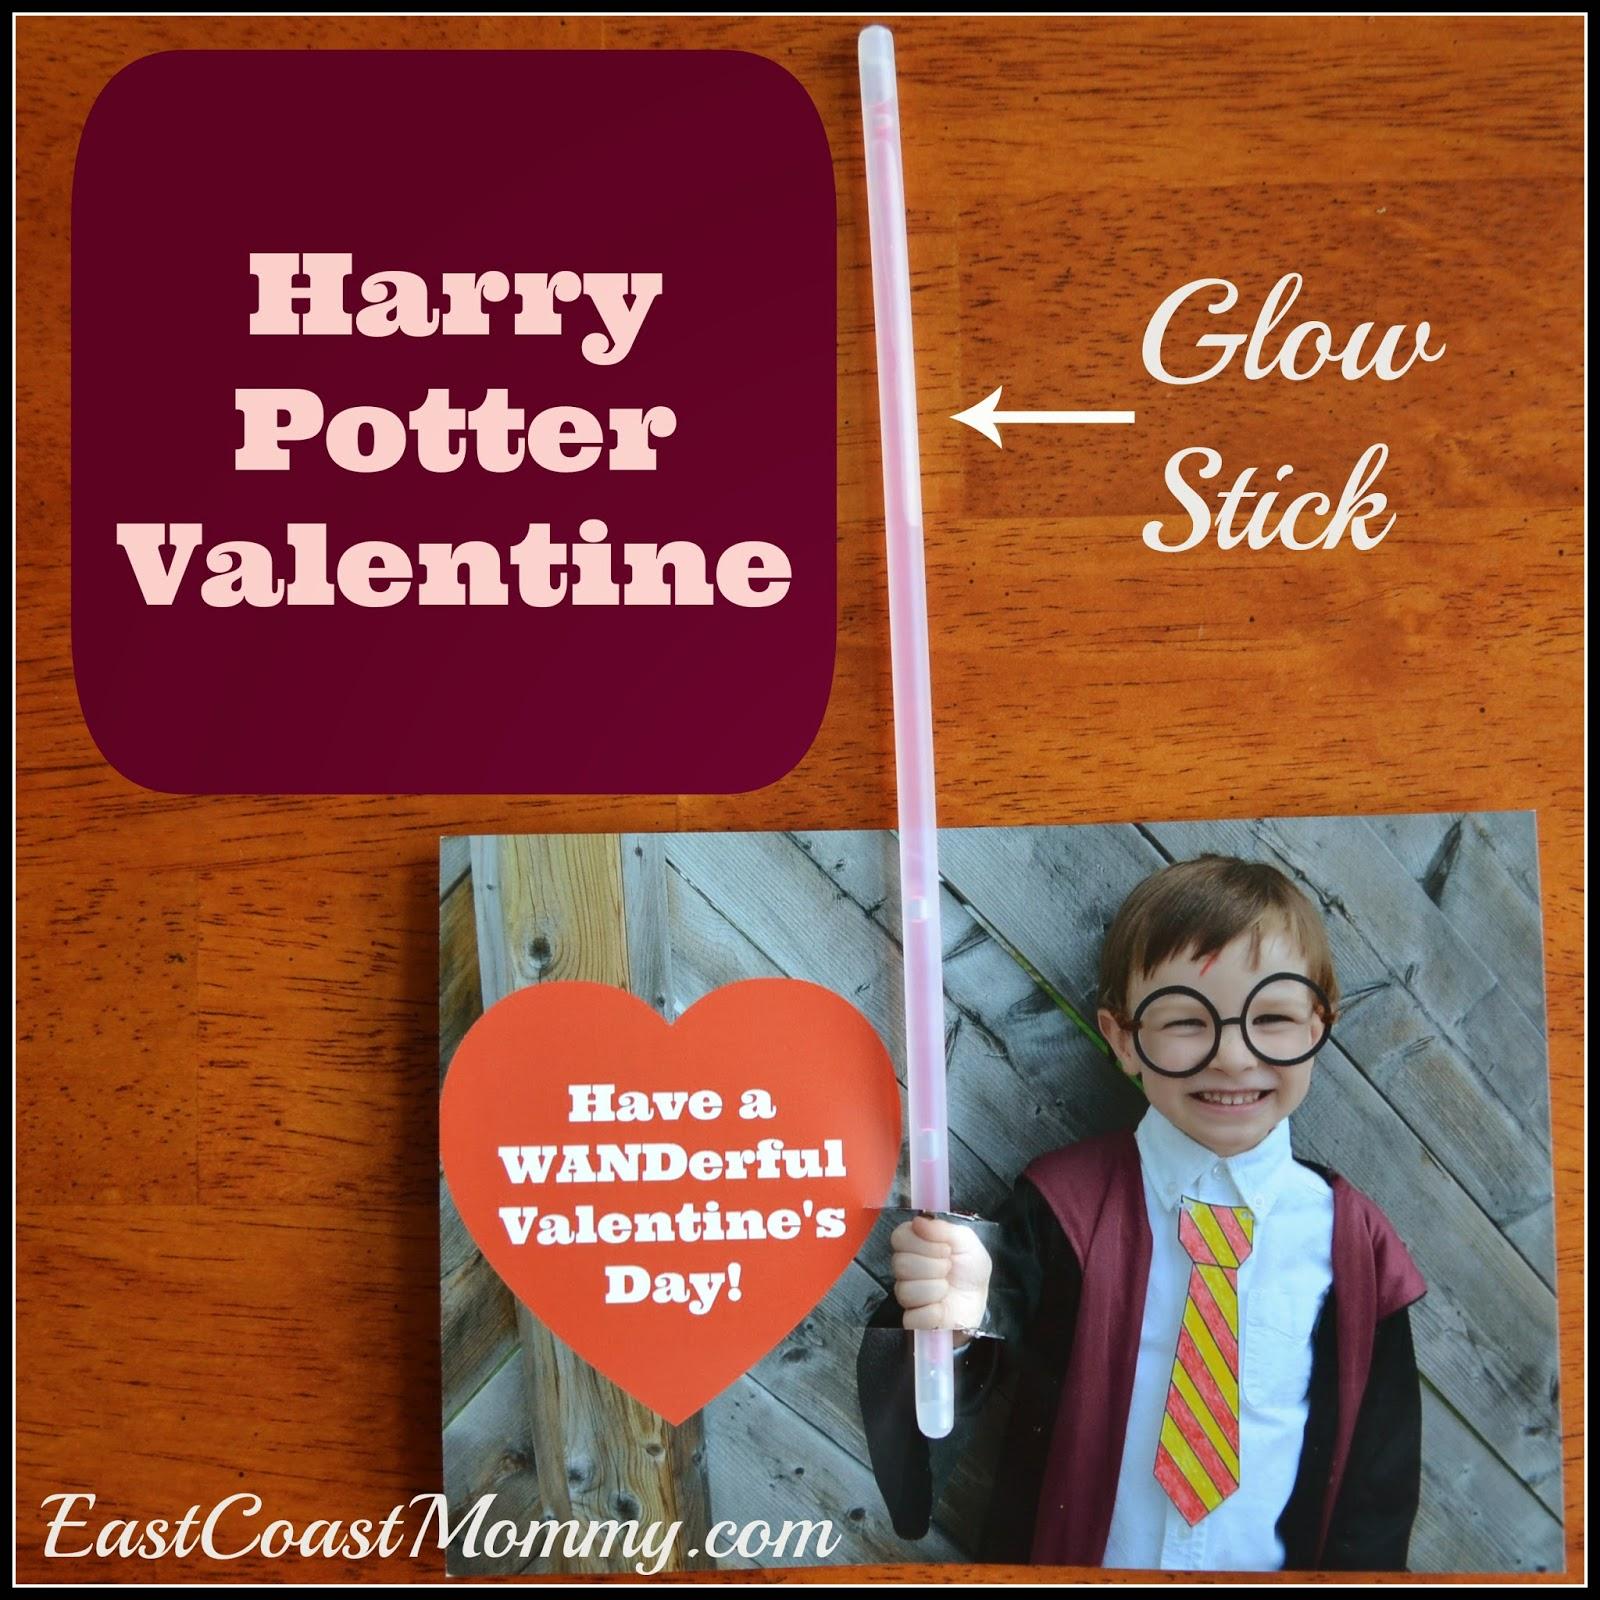 East Coast Mommy: Harry Potter Valentine